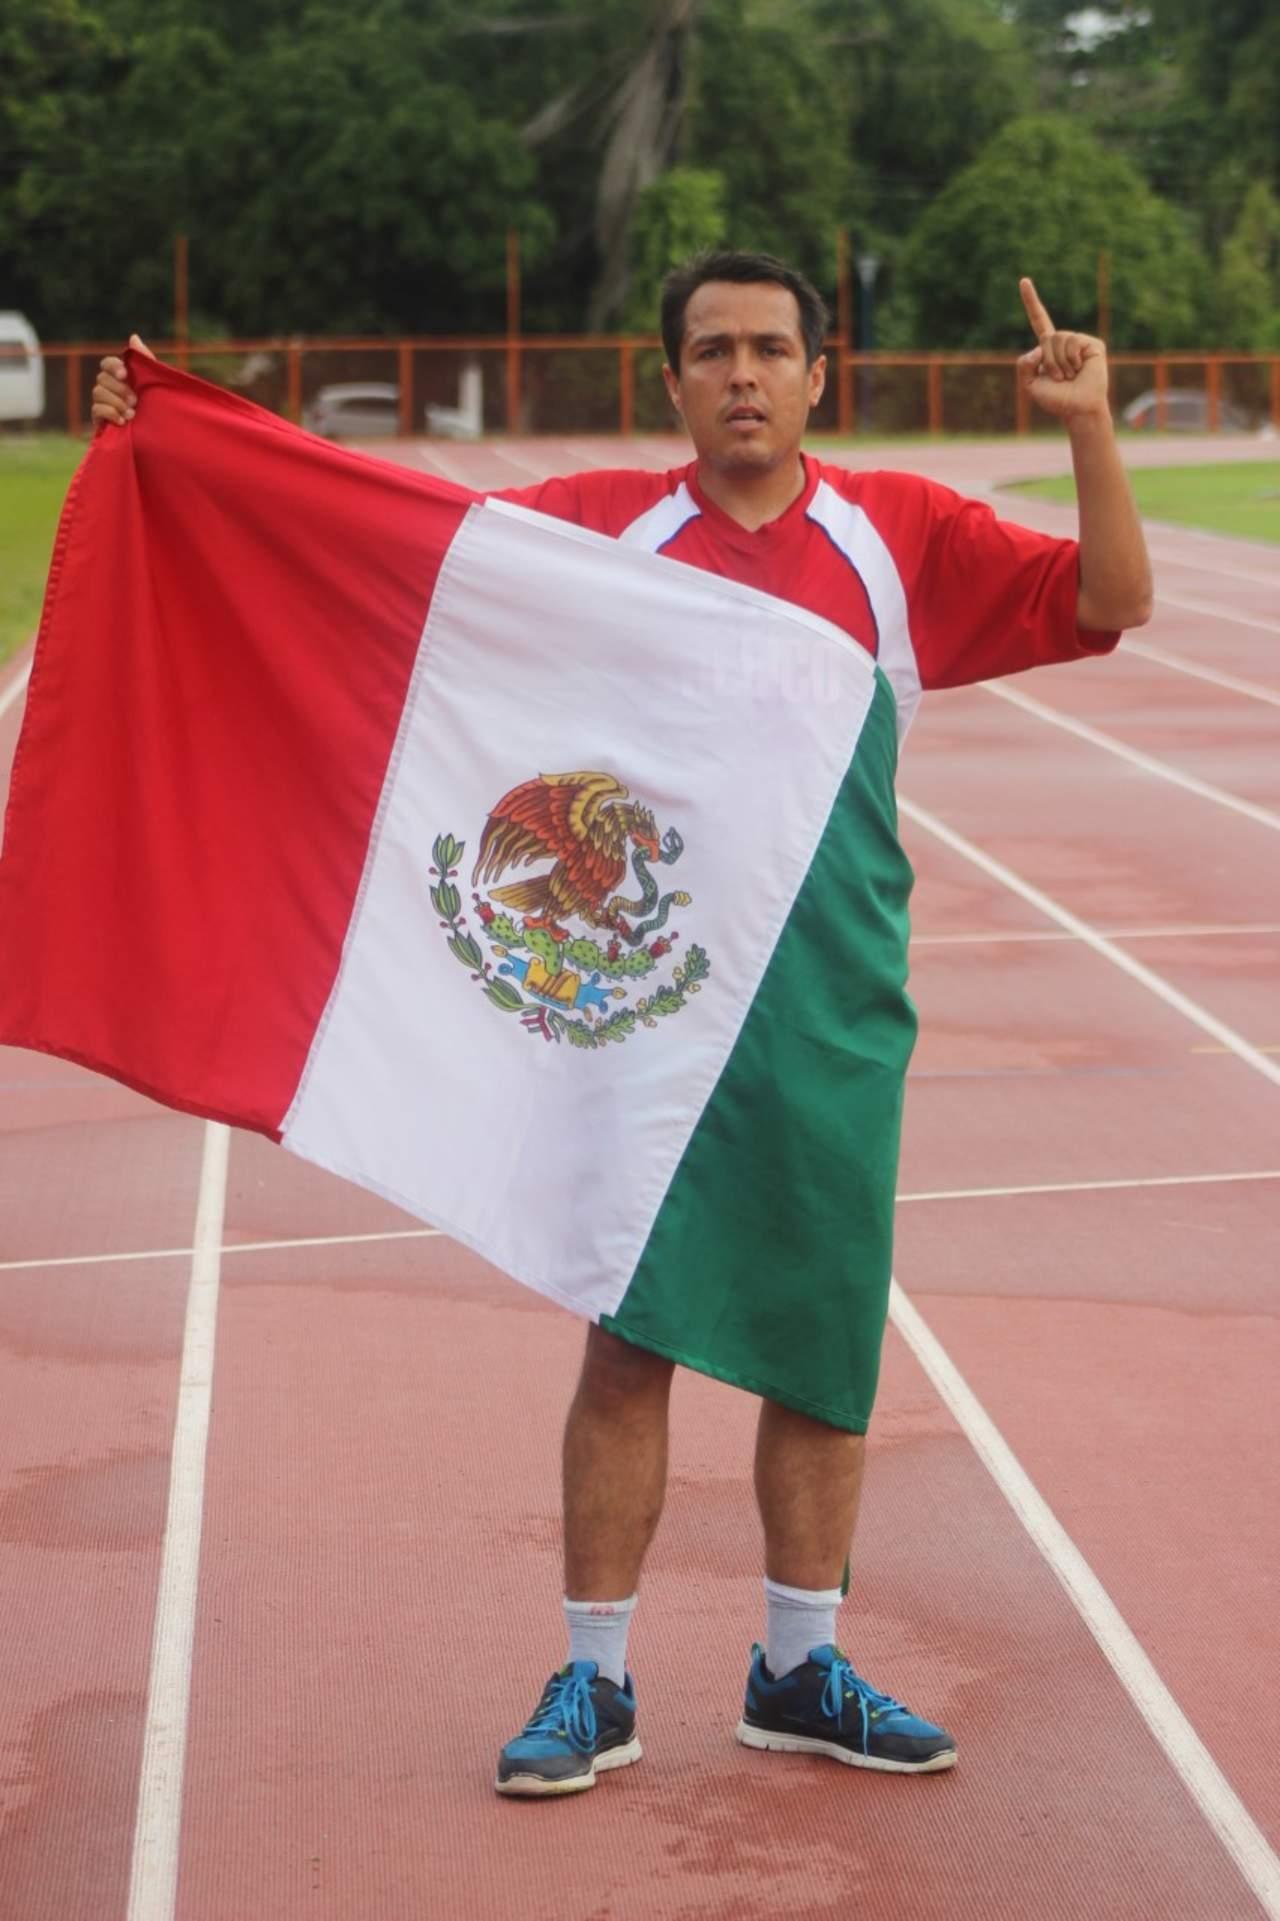 Más triunfos de mexicanos en Manaos